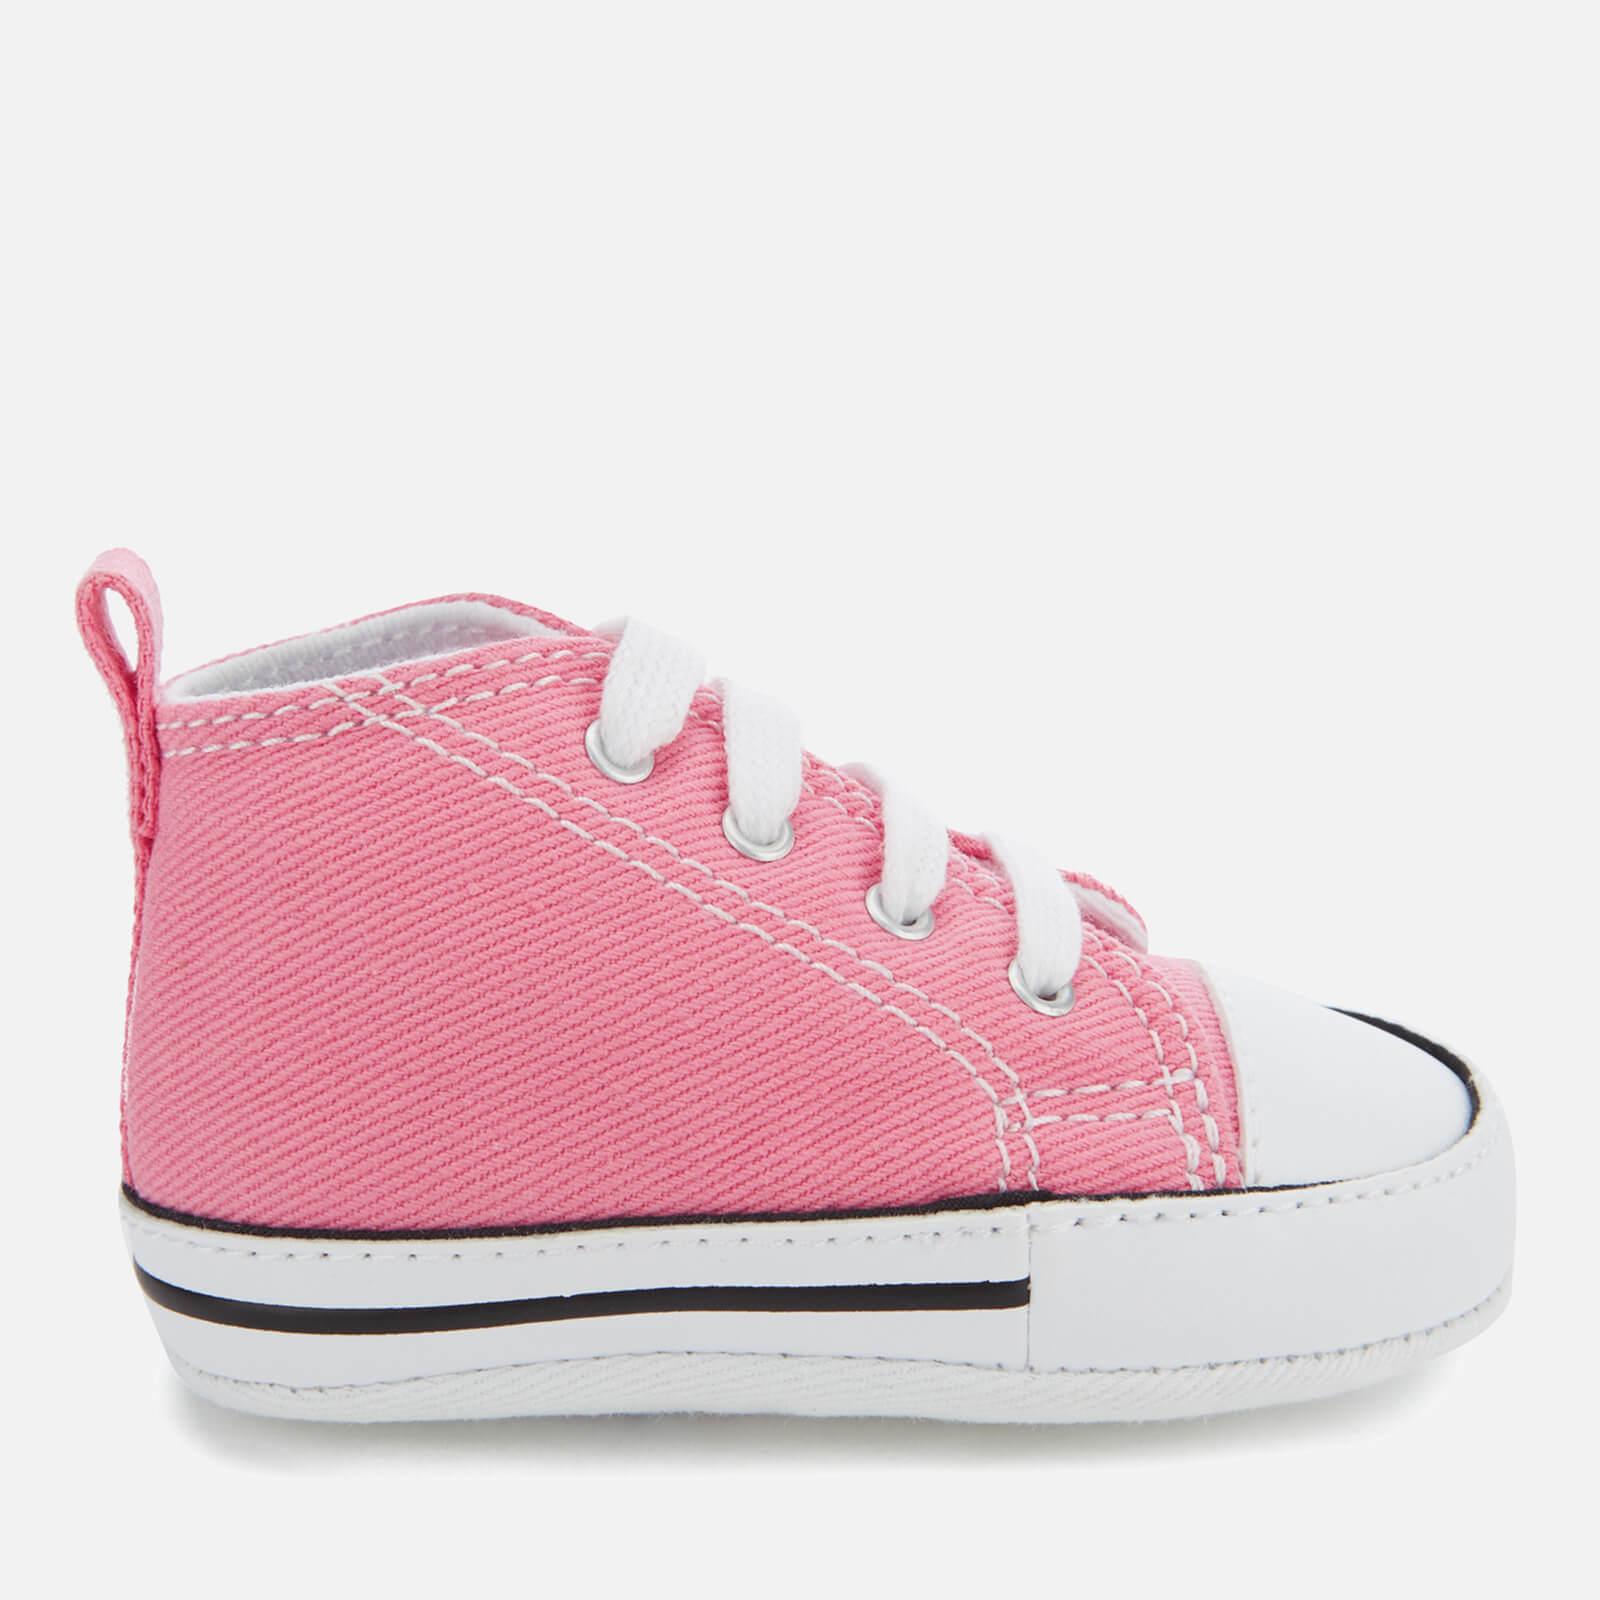 d8513d9d4b Converse Babies Chuck Taylor First Star Hi-Top Trainers - Pink ...